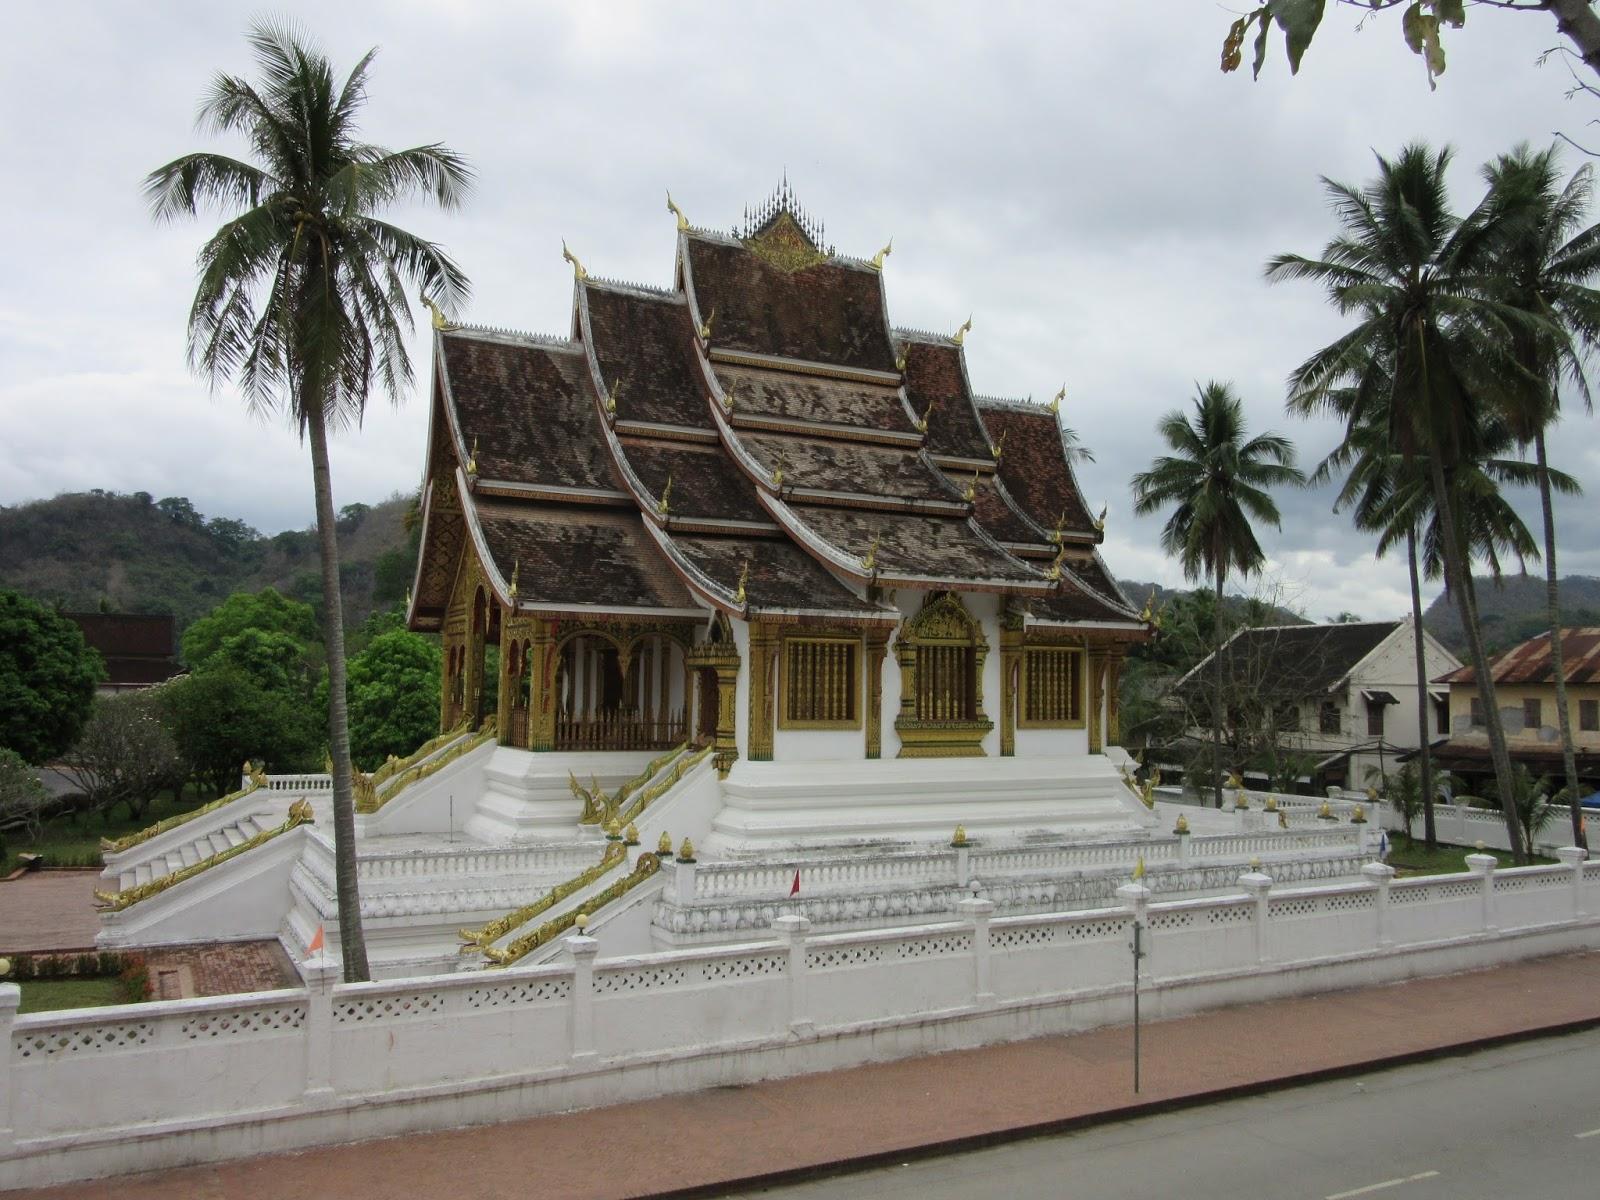 Templo en el centro histórico de Luang Prabang, Laos